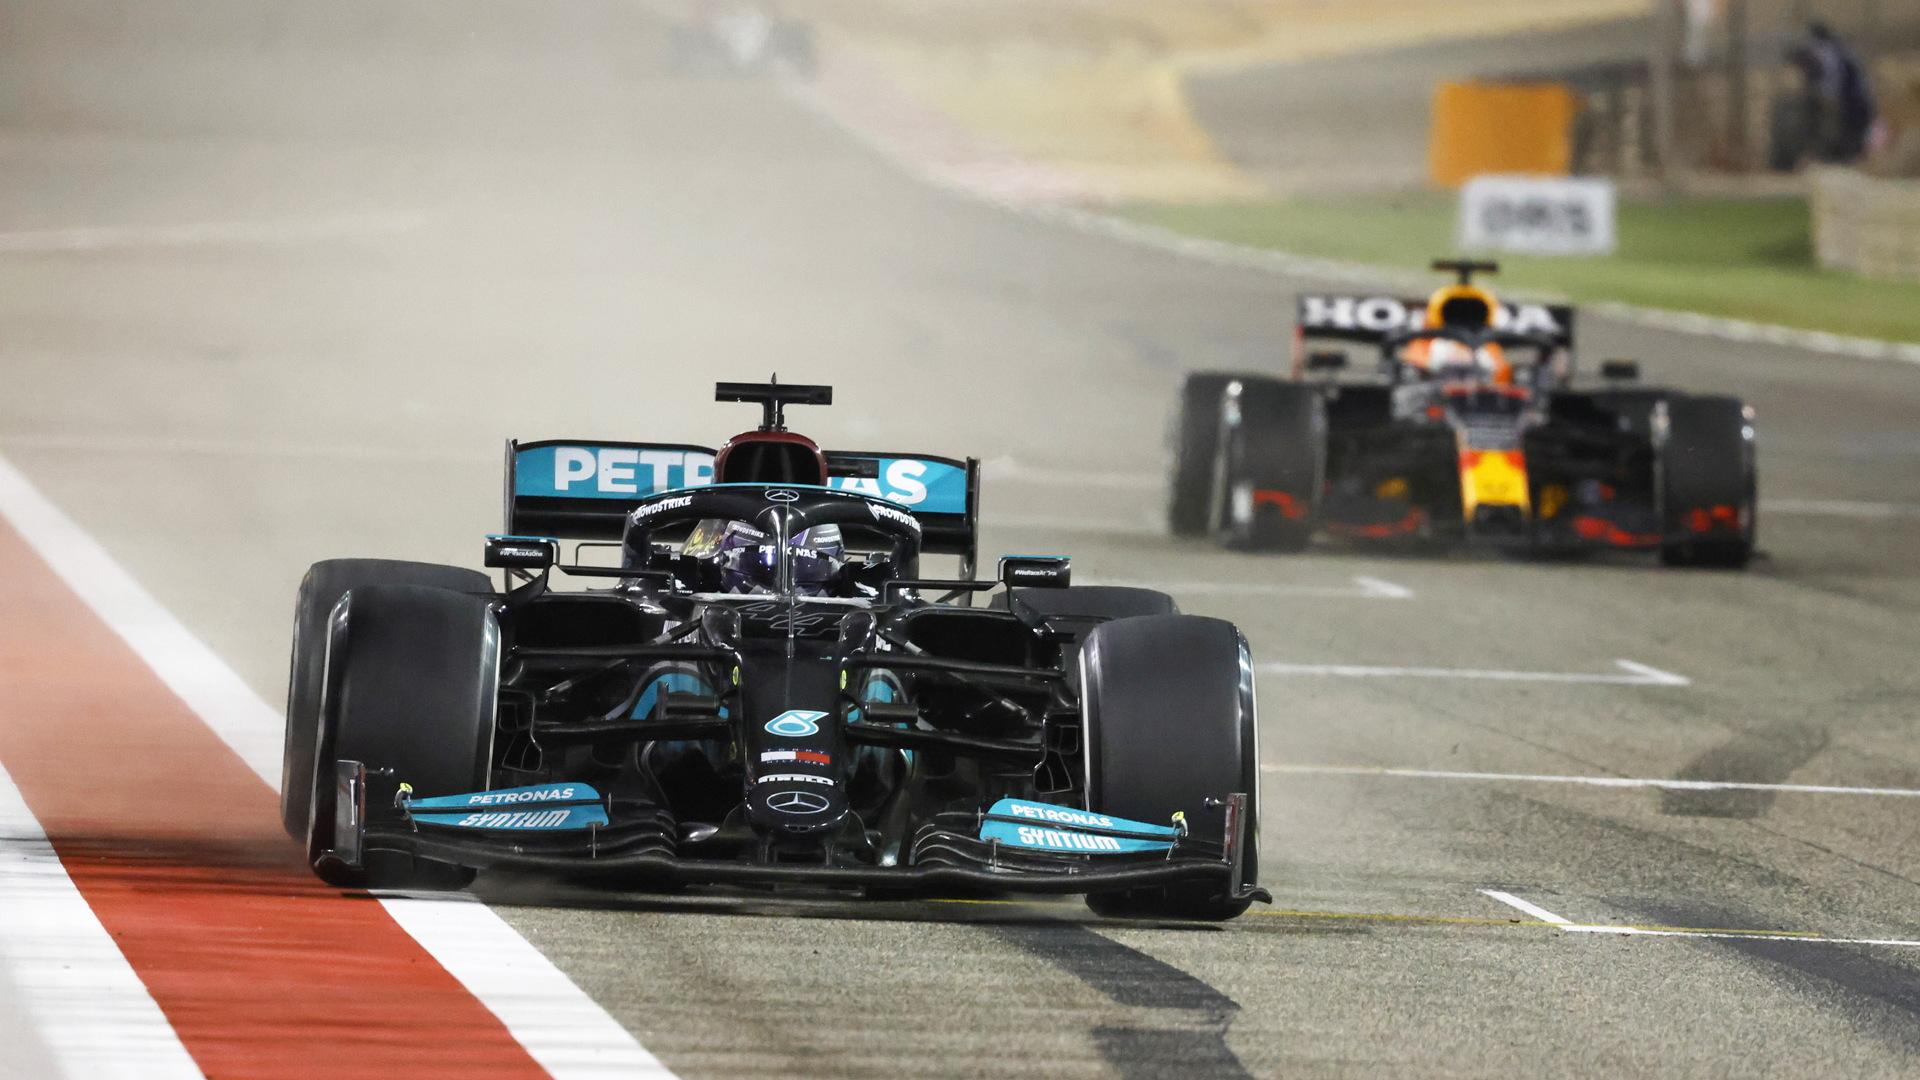 Mercedes-Benz AMG's Lewis Hamilton at the 2021 Formula One Bahrain Grand Prix